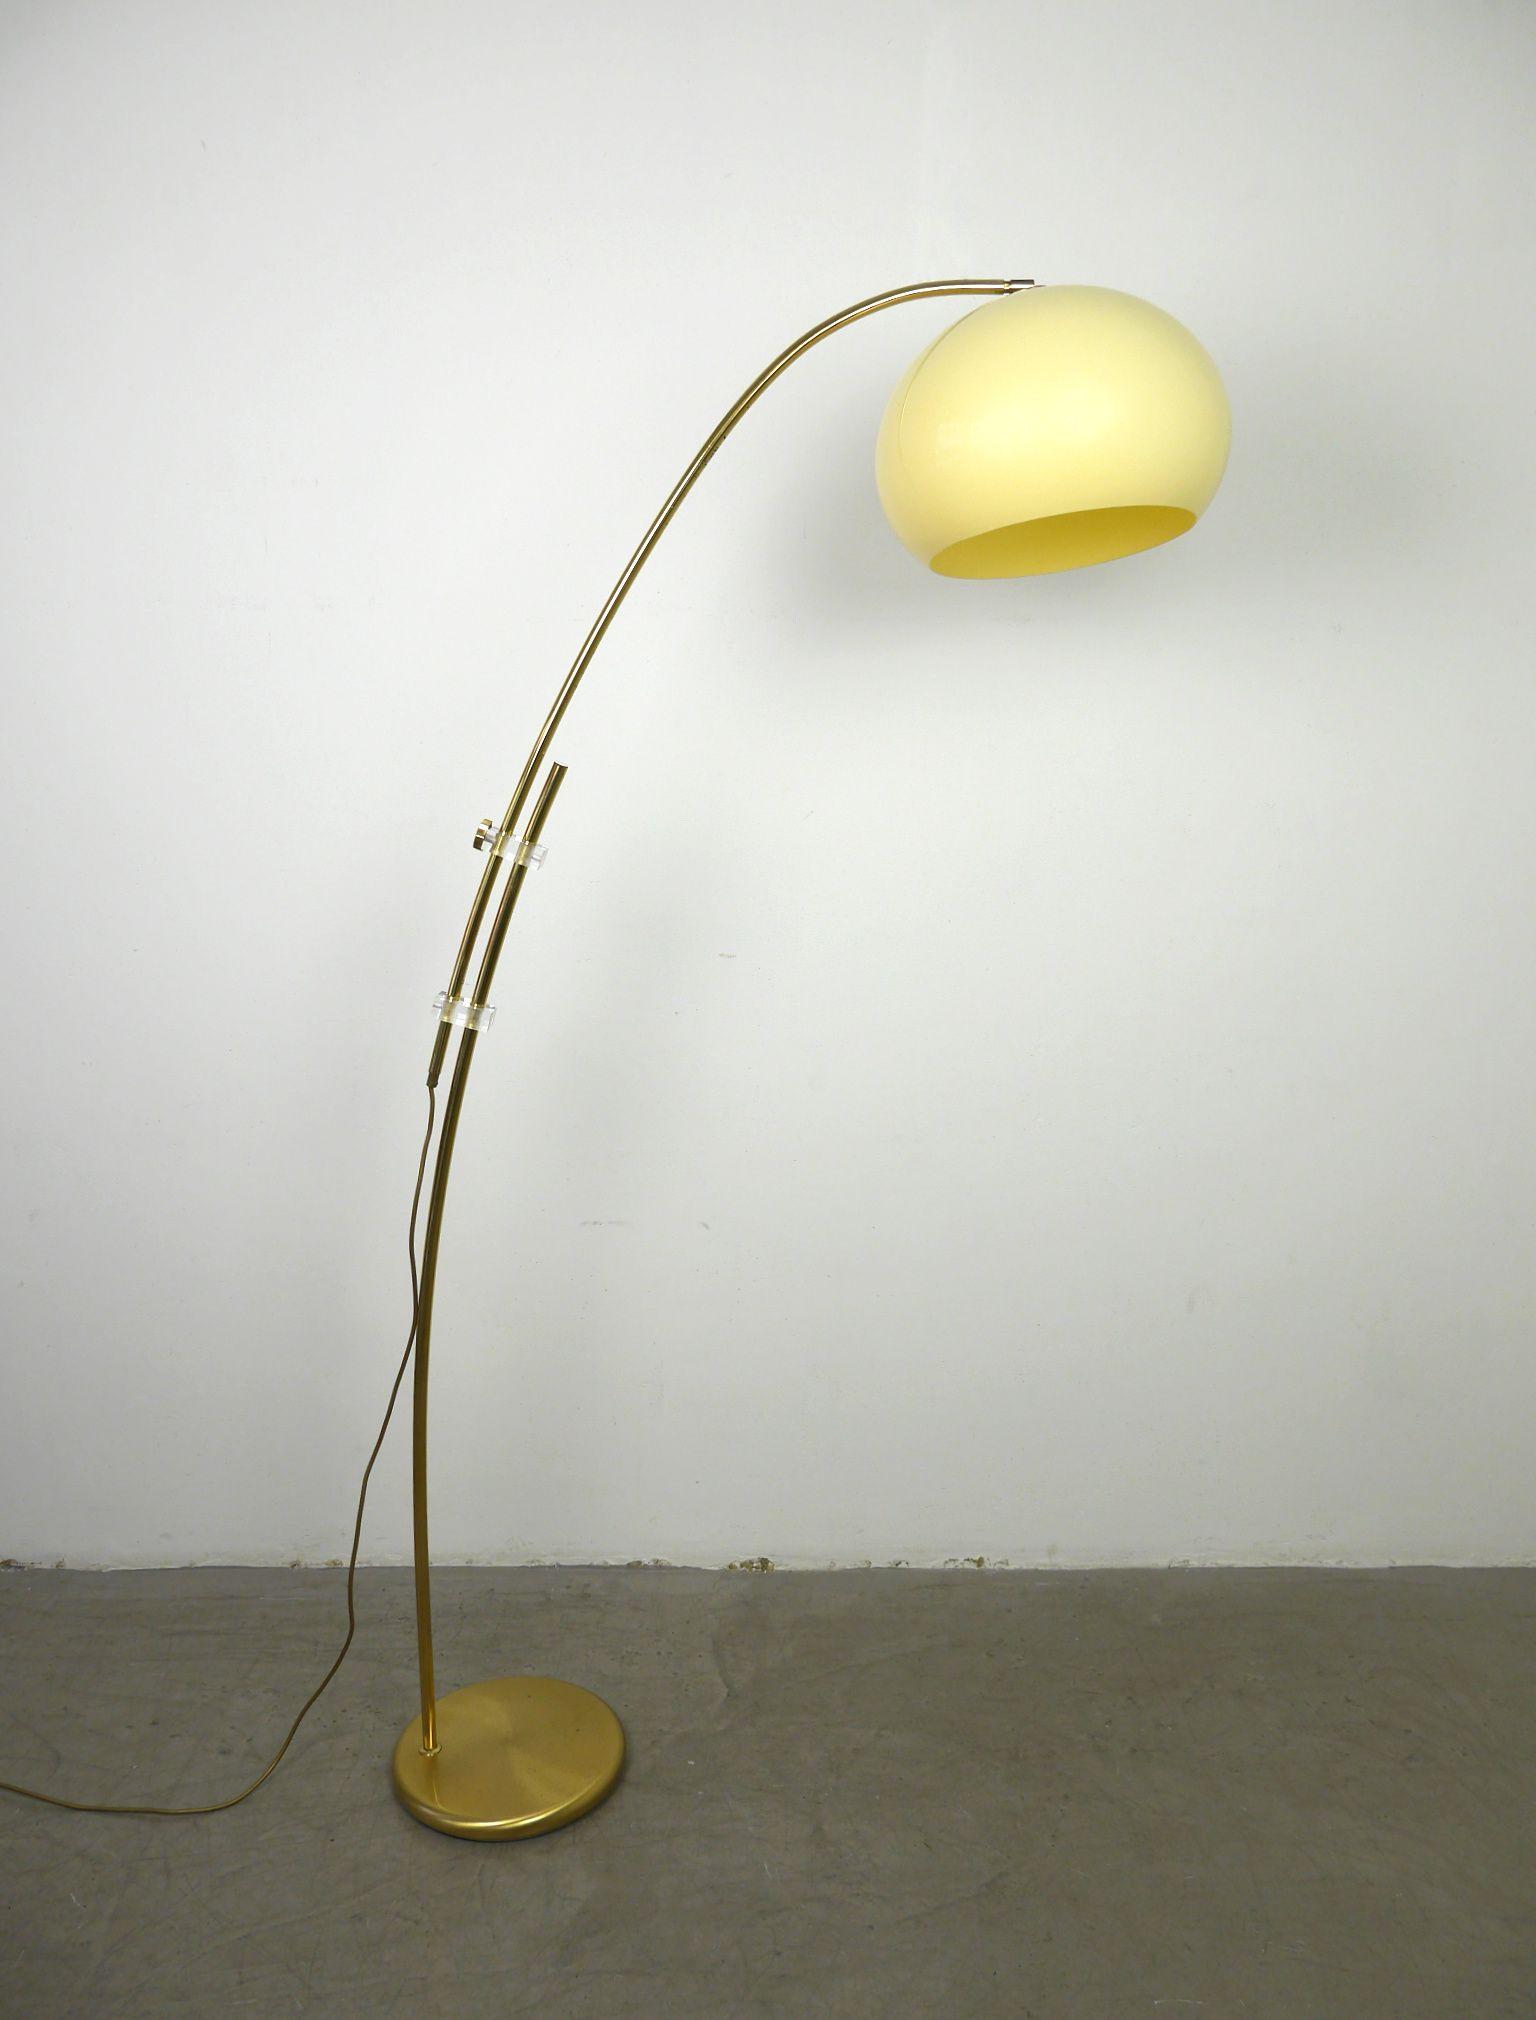 Vintage adjustable brass arc floor lamp, Germany, 1970s ...